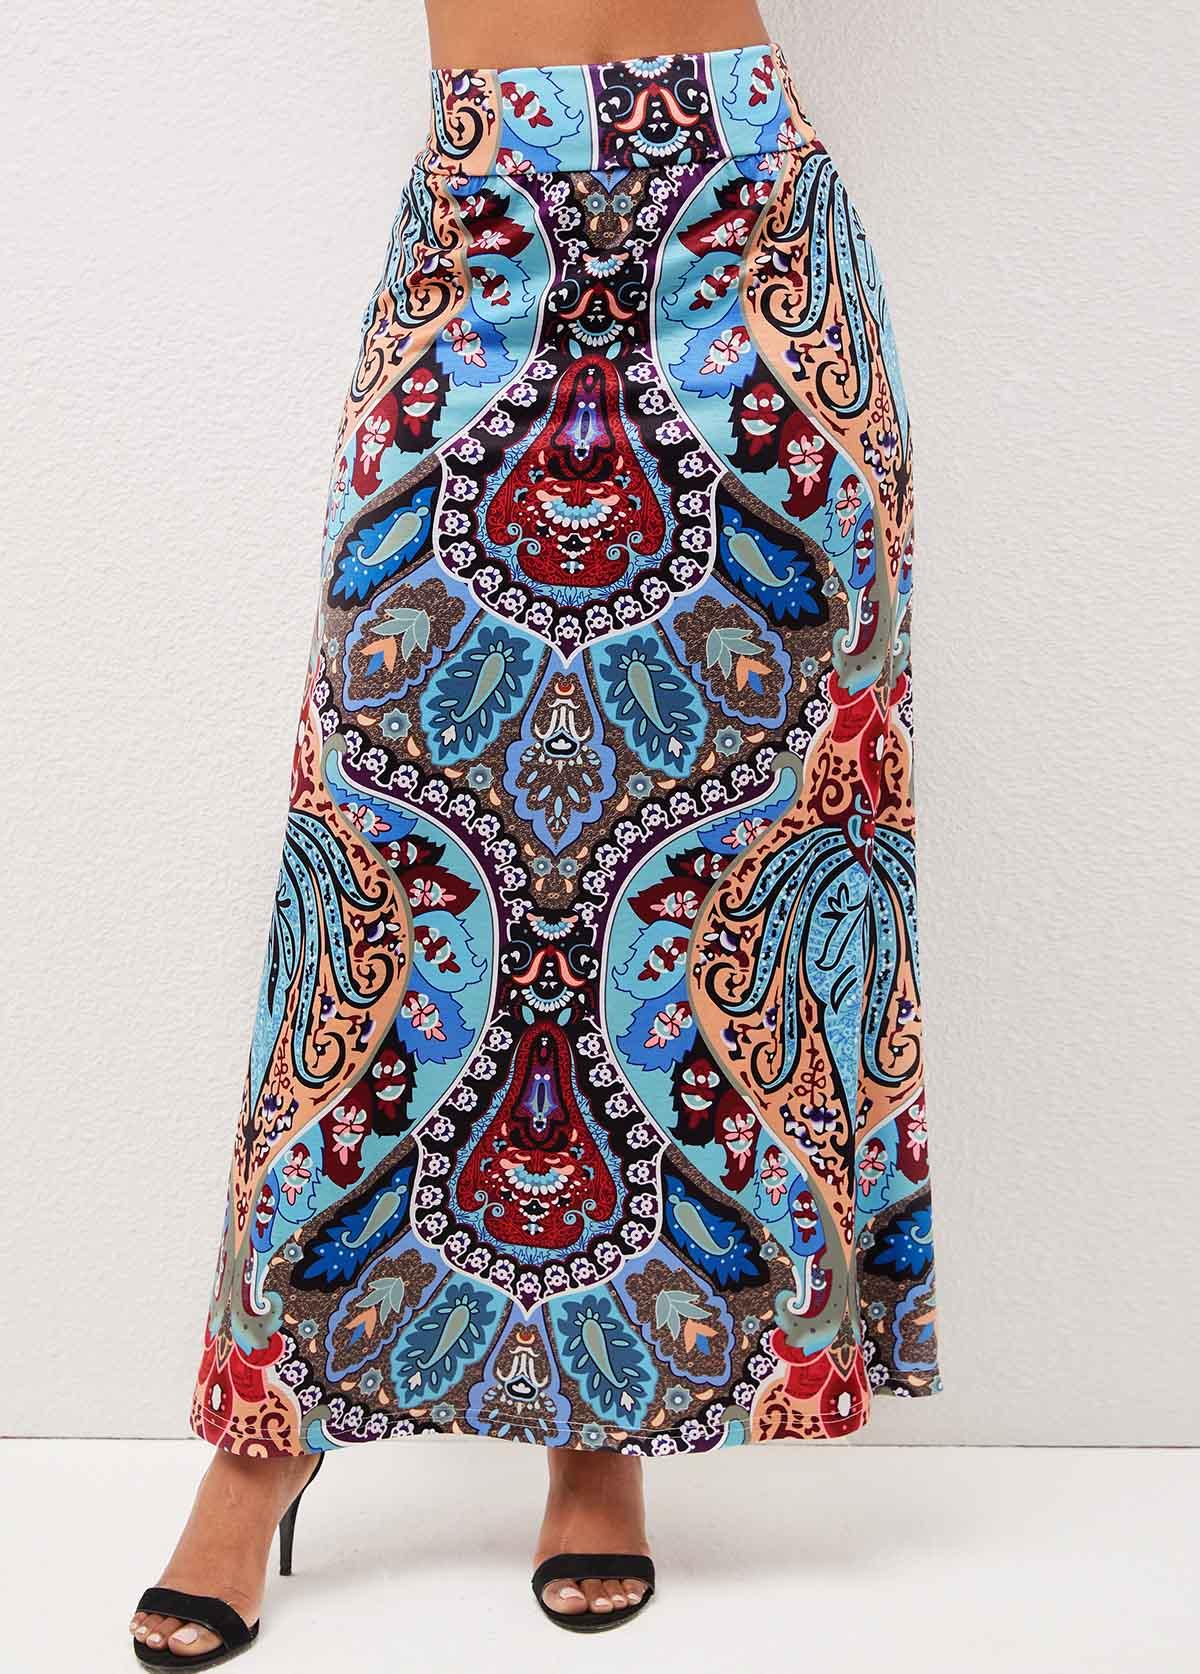 Tribal Print High Waist Multi Color Skirt